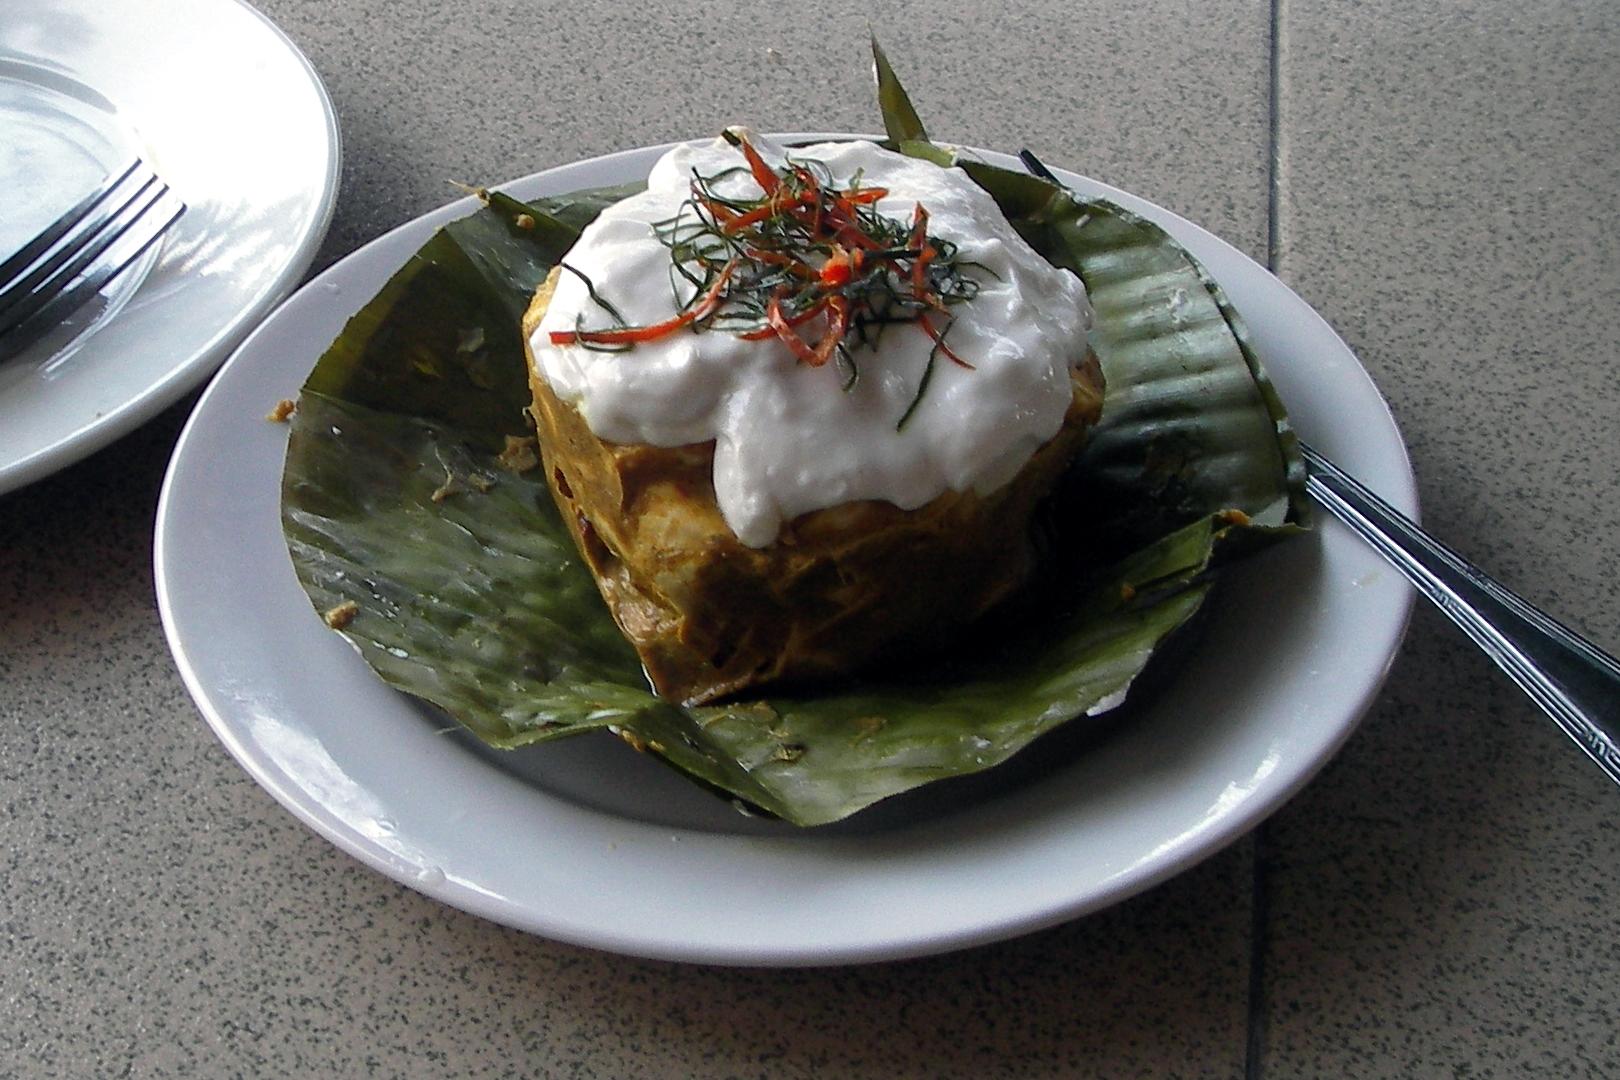 Cambodian cuisine vanndeth53010410161 for Angkor borei cambodian cuisine